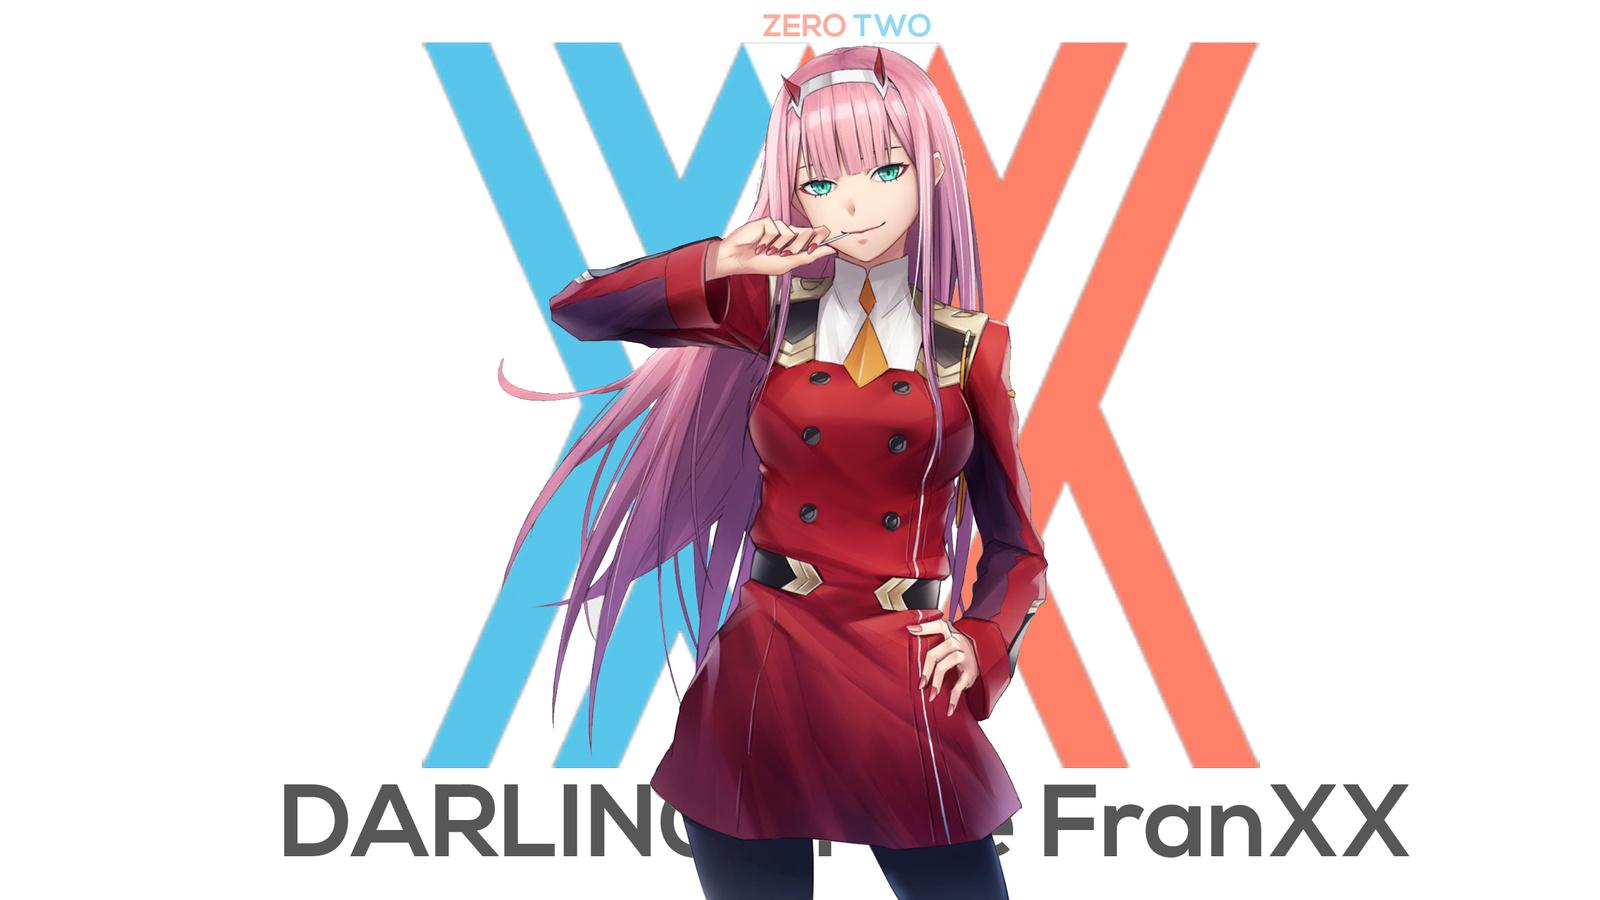 002, zero two, darling in the franxx